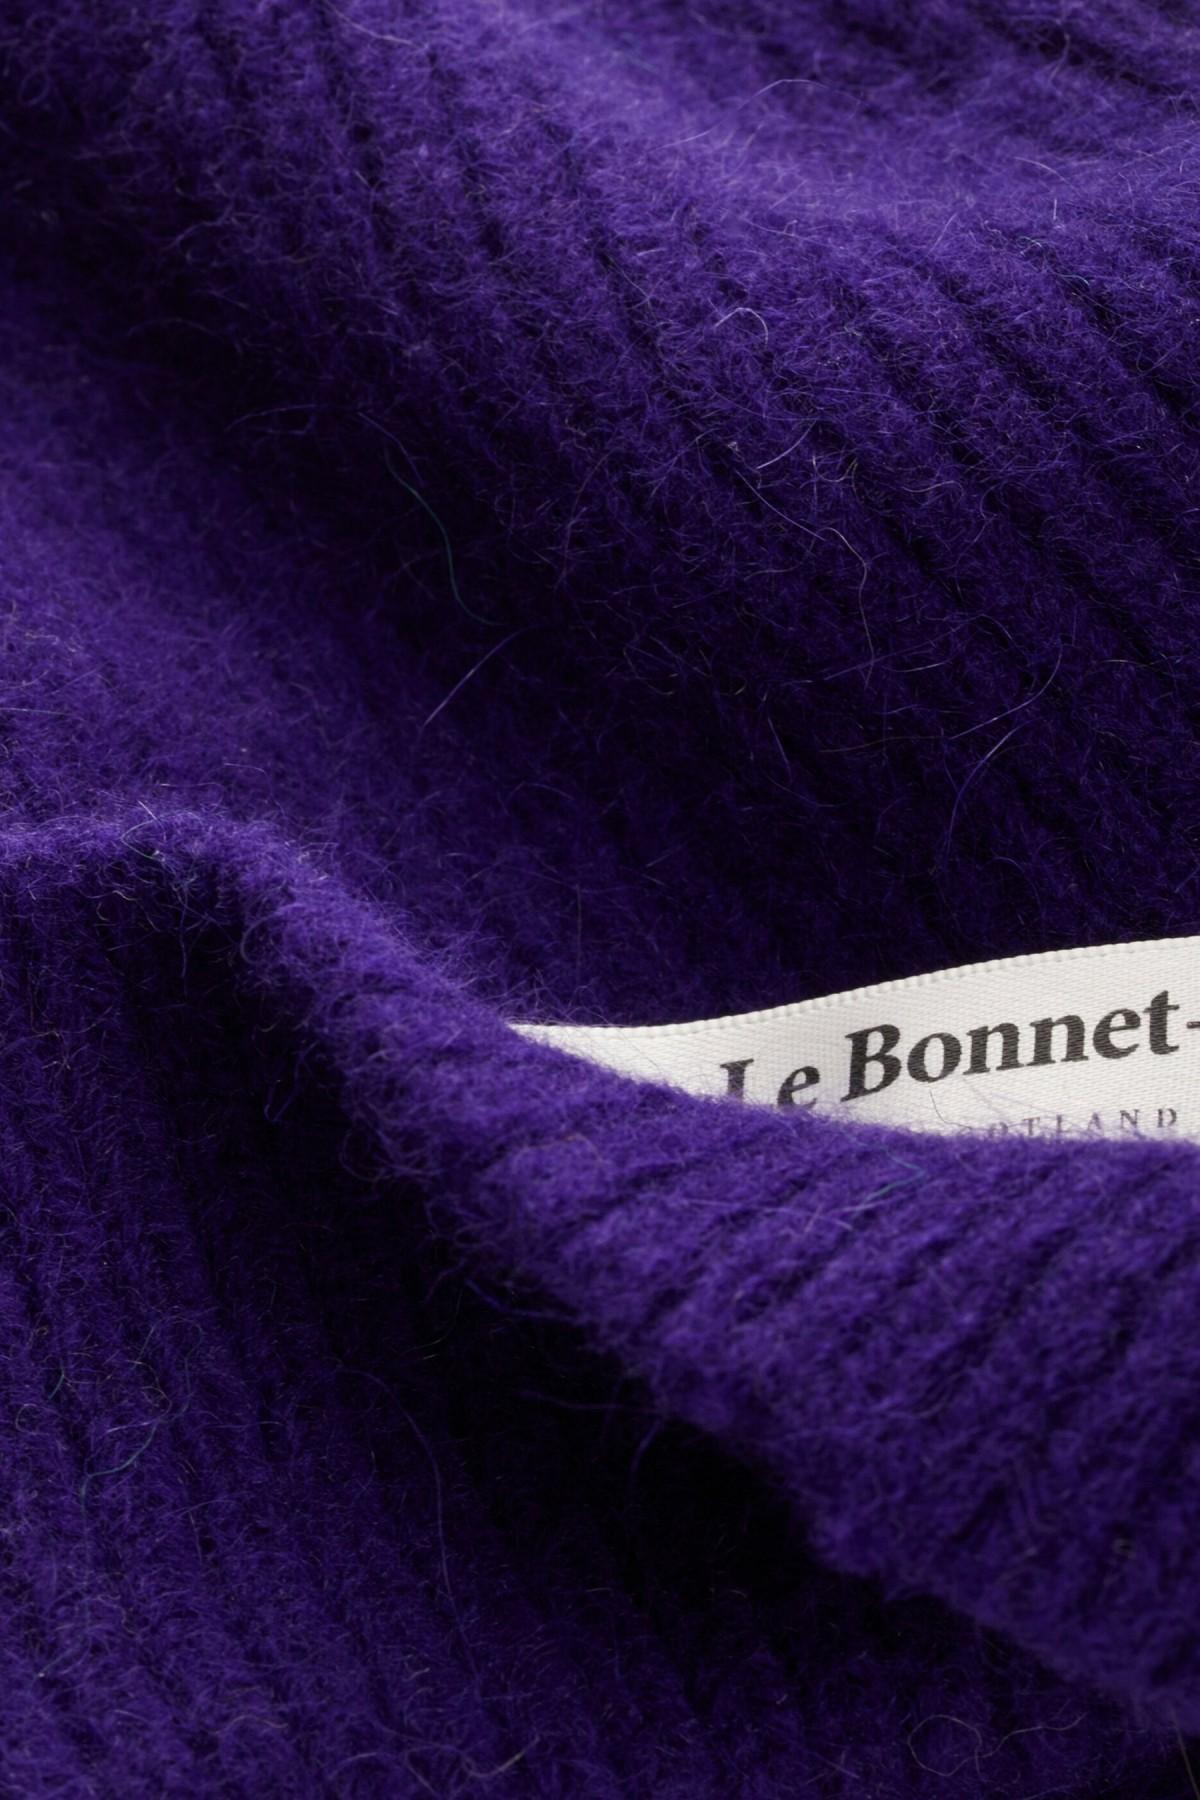 LeBonnet Beanie in Indigo